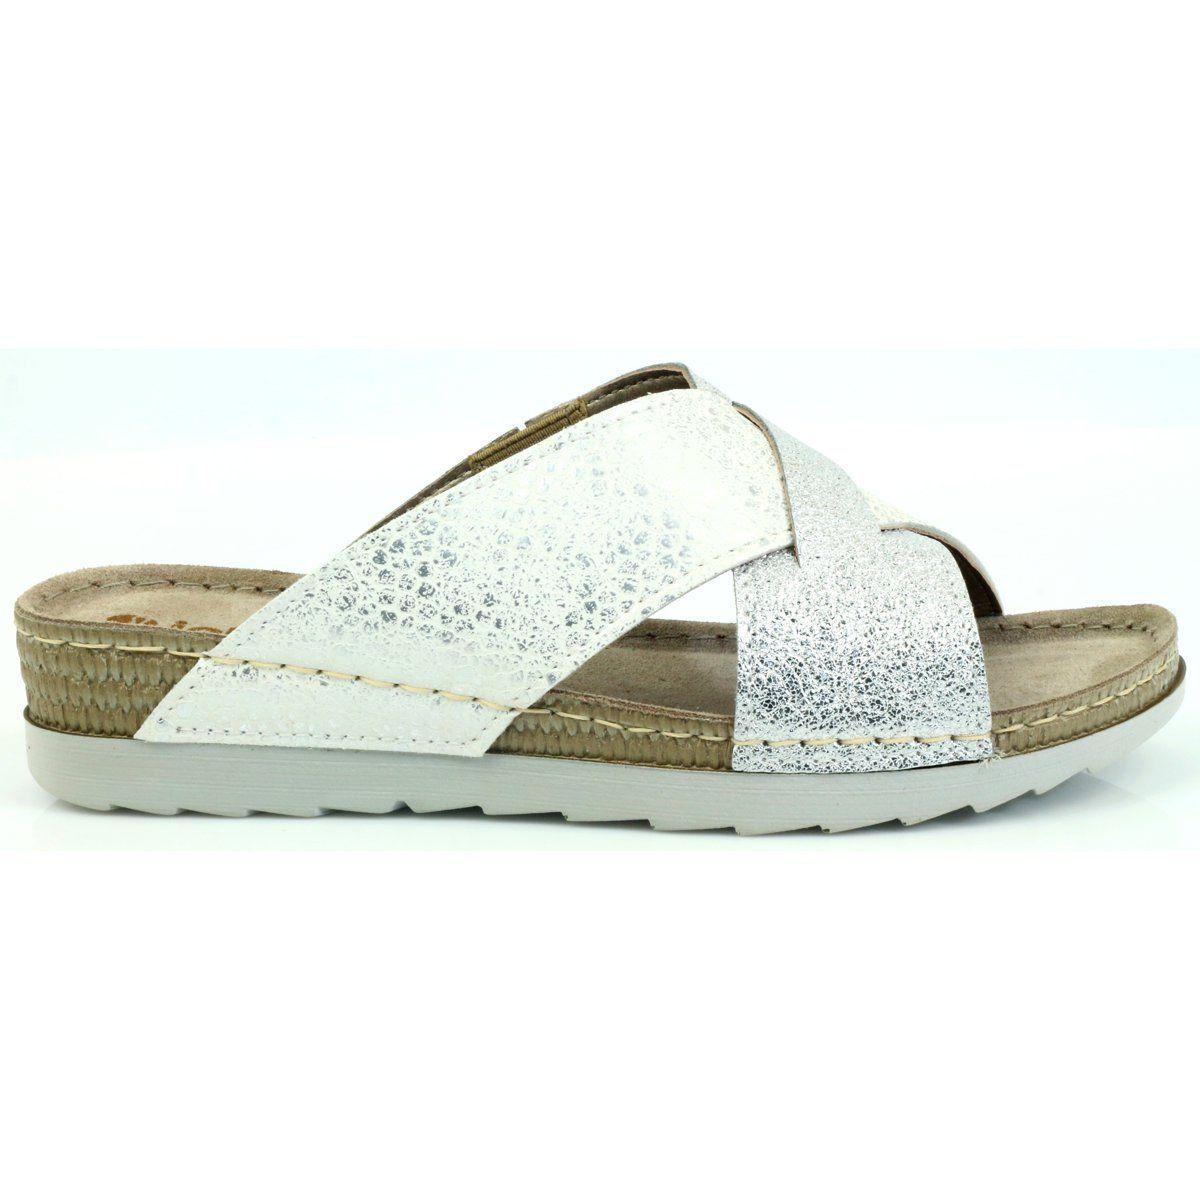 Klapki Komfort Inblu 010 Teg H Biale Szare Slip On Sandal Footwear Shoes